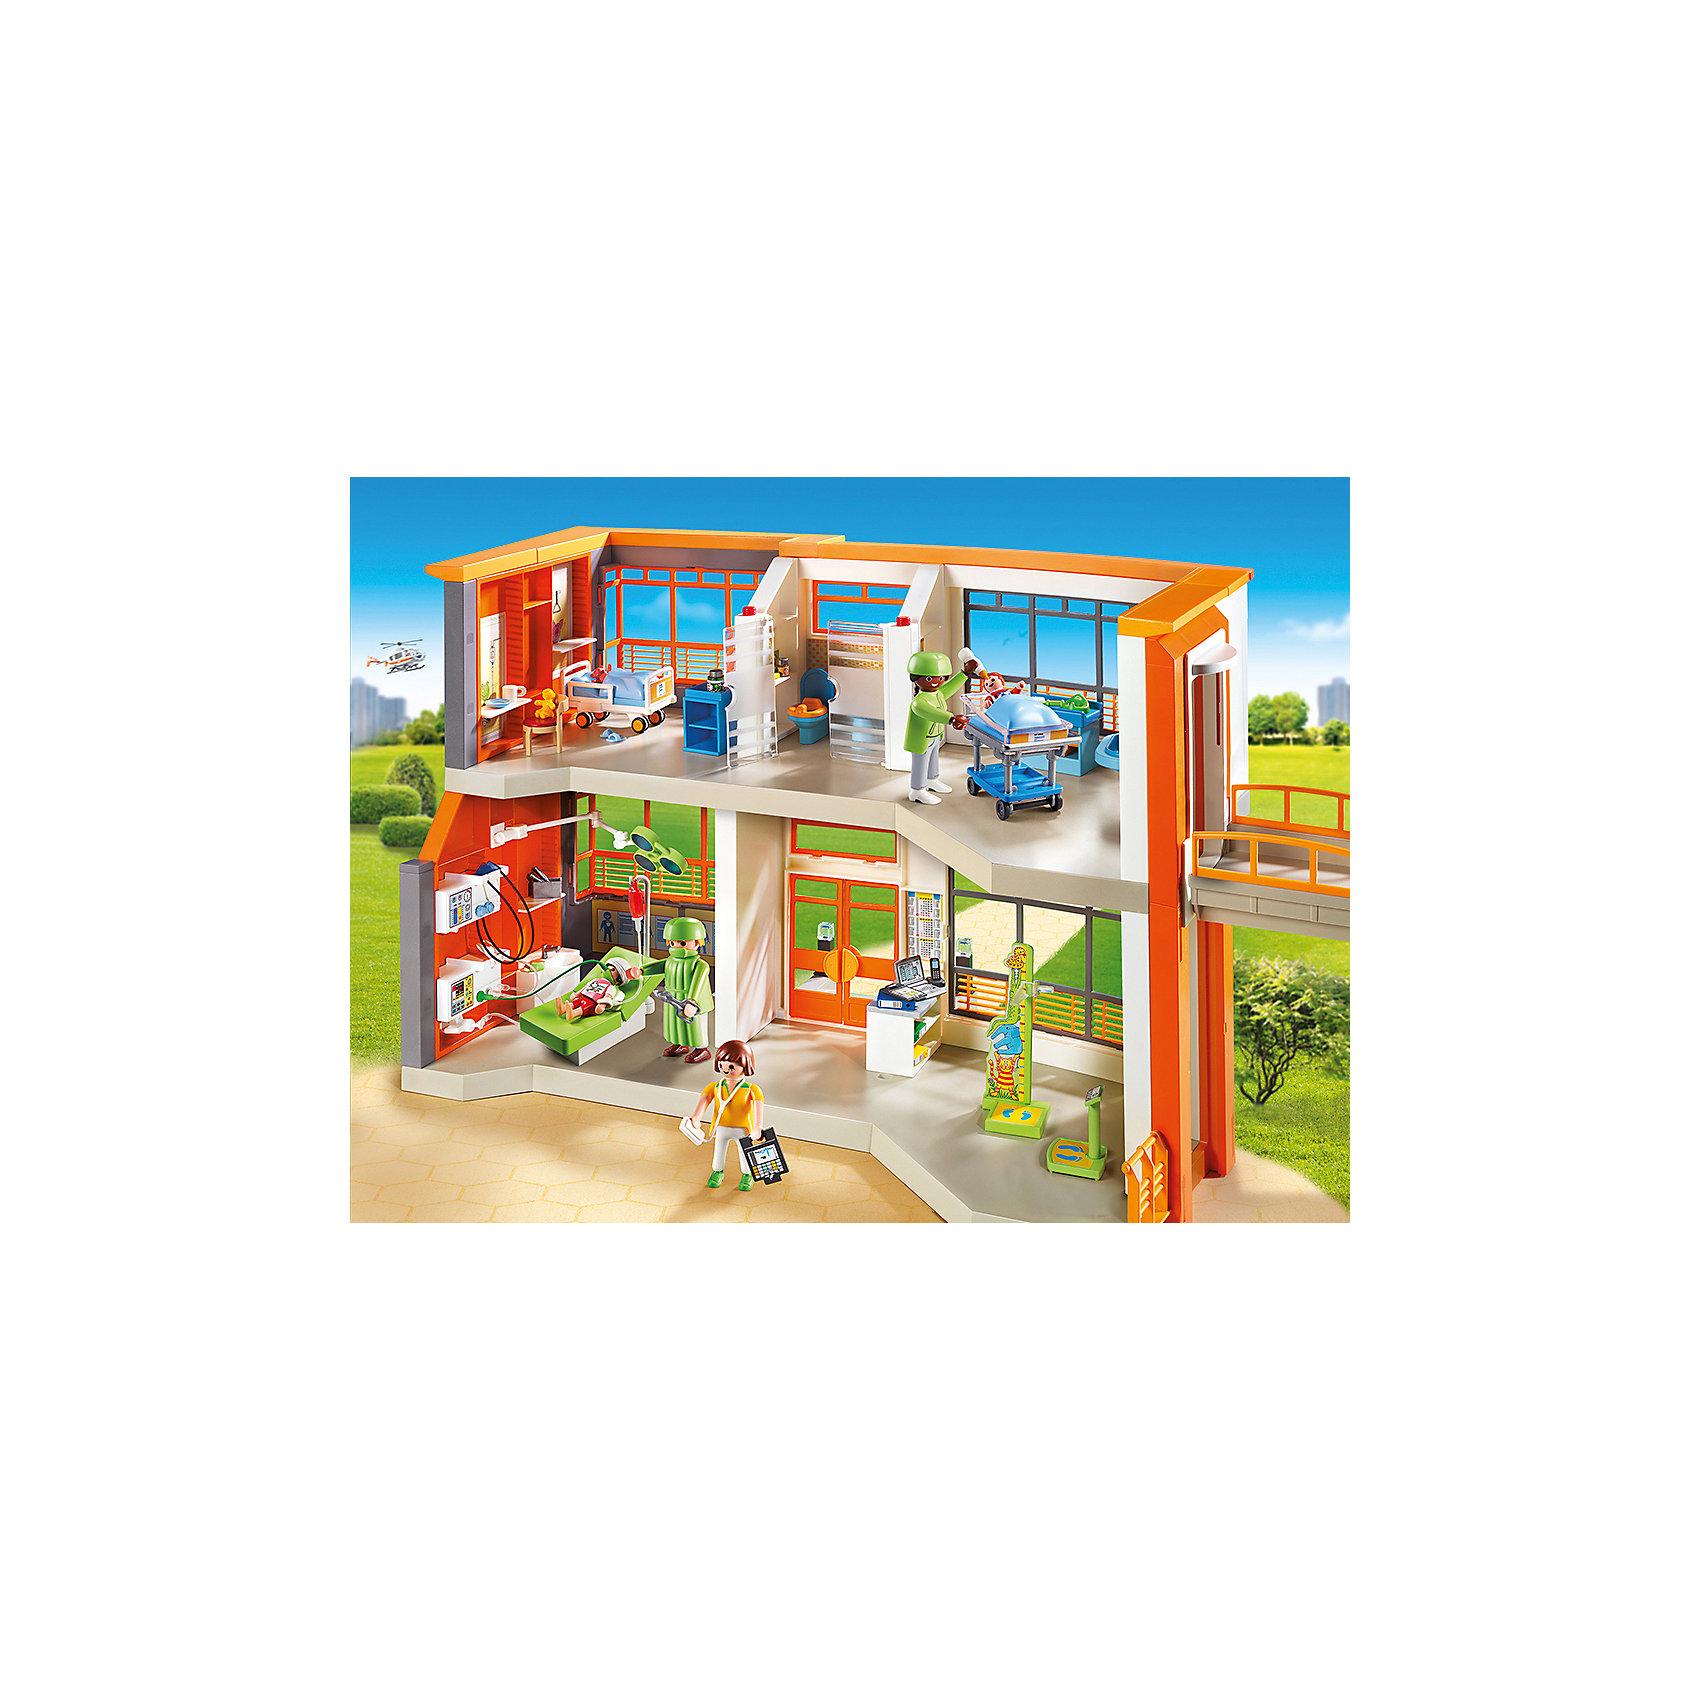 PLAYMOBIL® PLAYMOBIL 5531 Ветеринарная клиника: Уход за животными